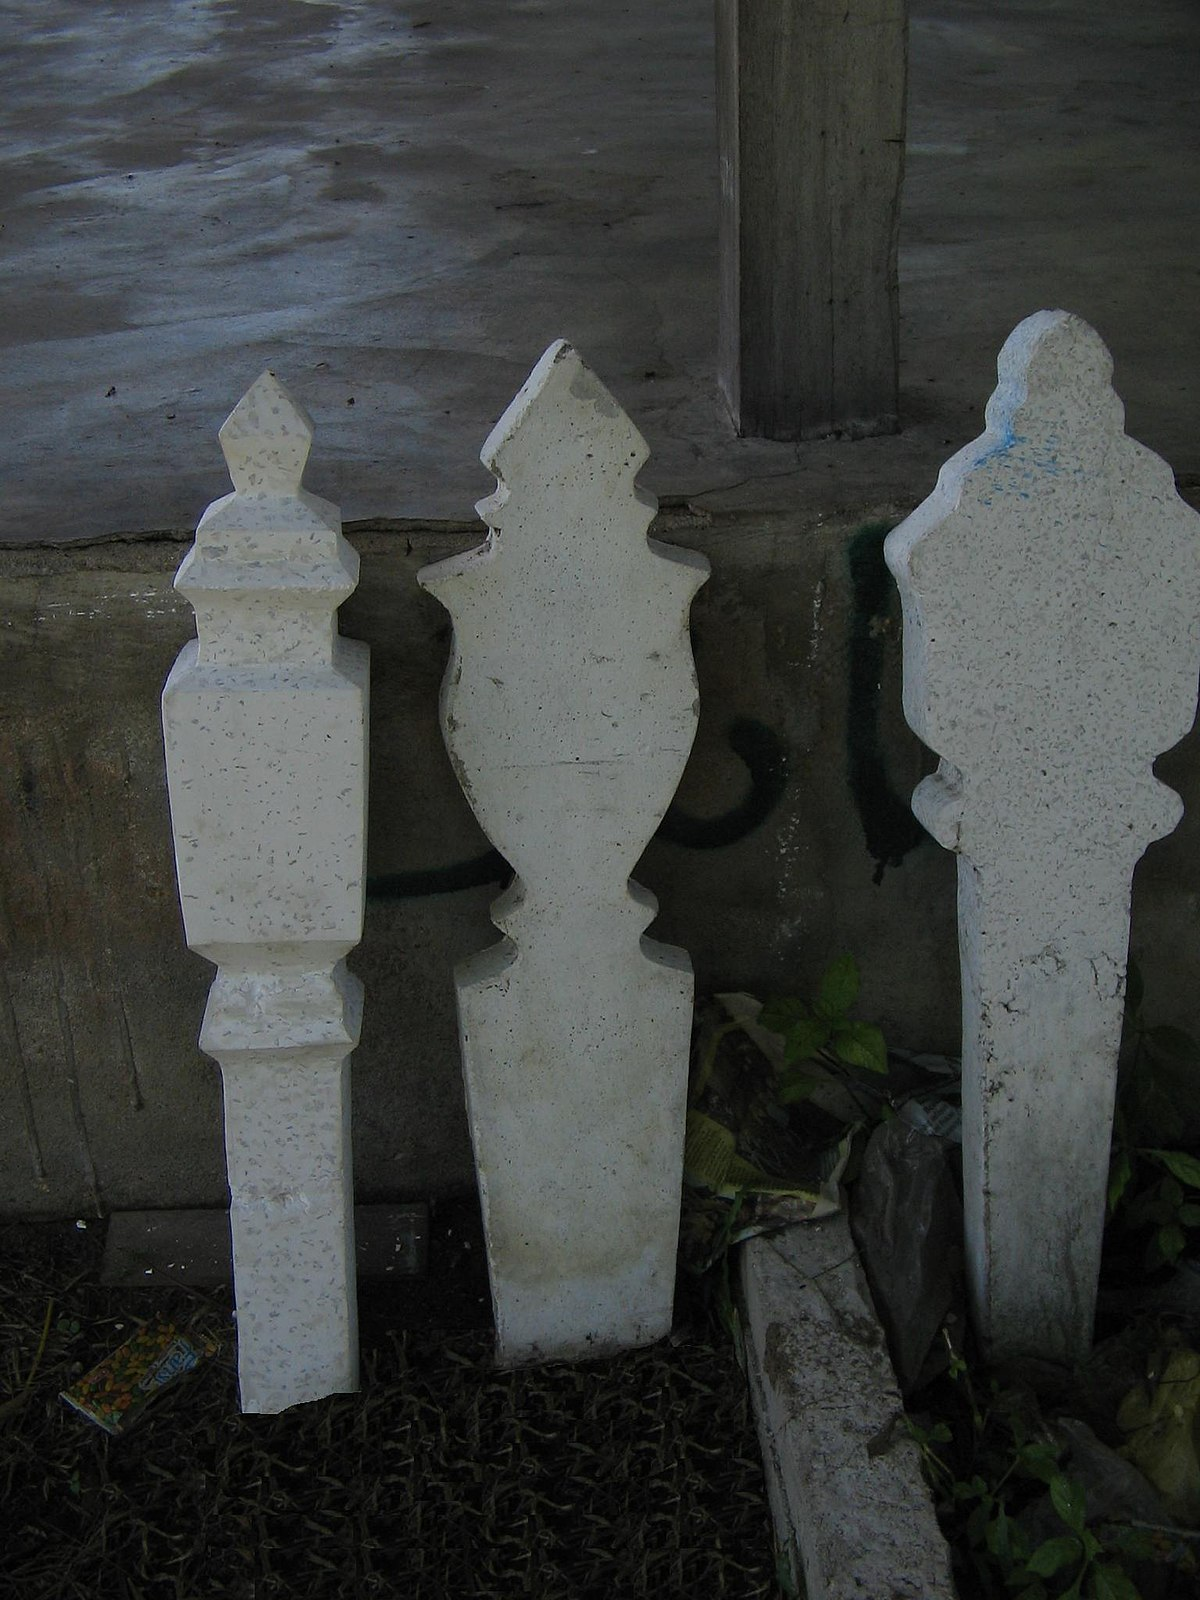 Batu nisan - Wikipedia Bahasa Melayu, ensiklopedia bebas